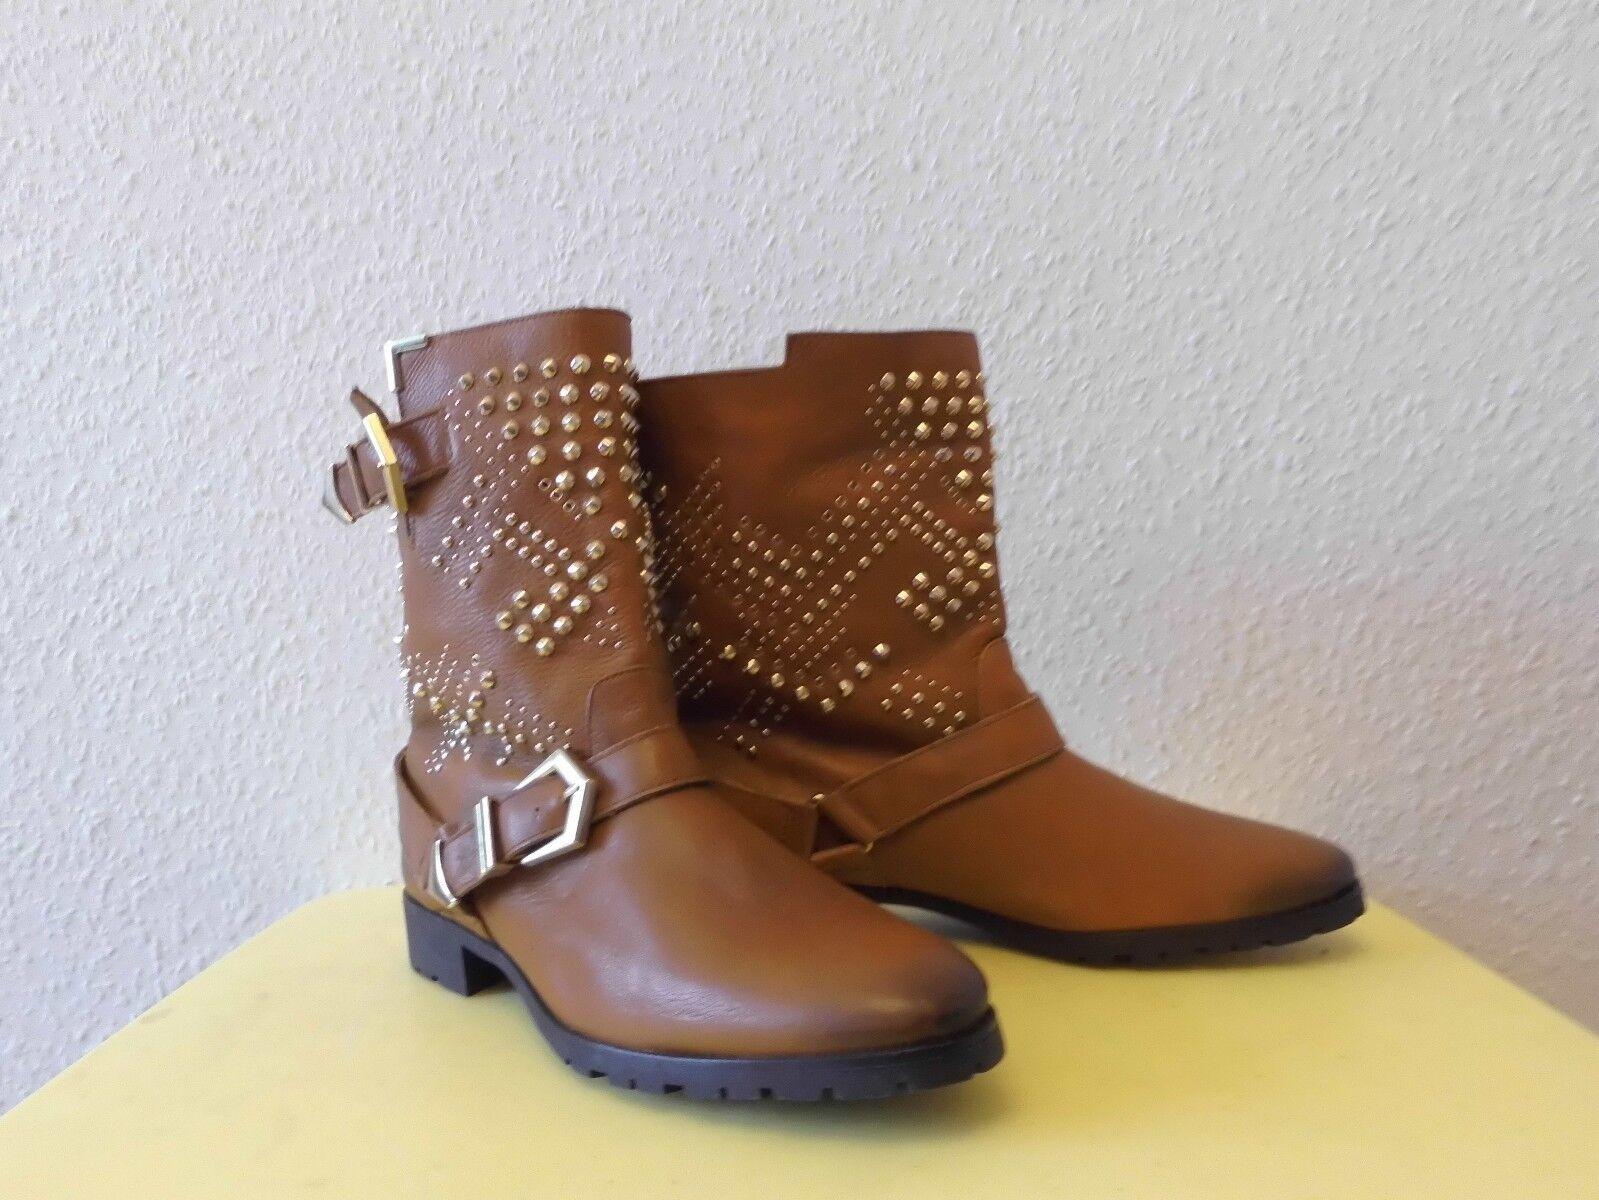 c286cf3e10de ... Stiefeletten Schlupfstiefeletten Boots Zara Leder Woman Gr.40 Leder TOP  mit Nieten 764387 ...